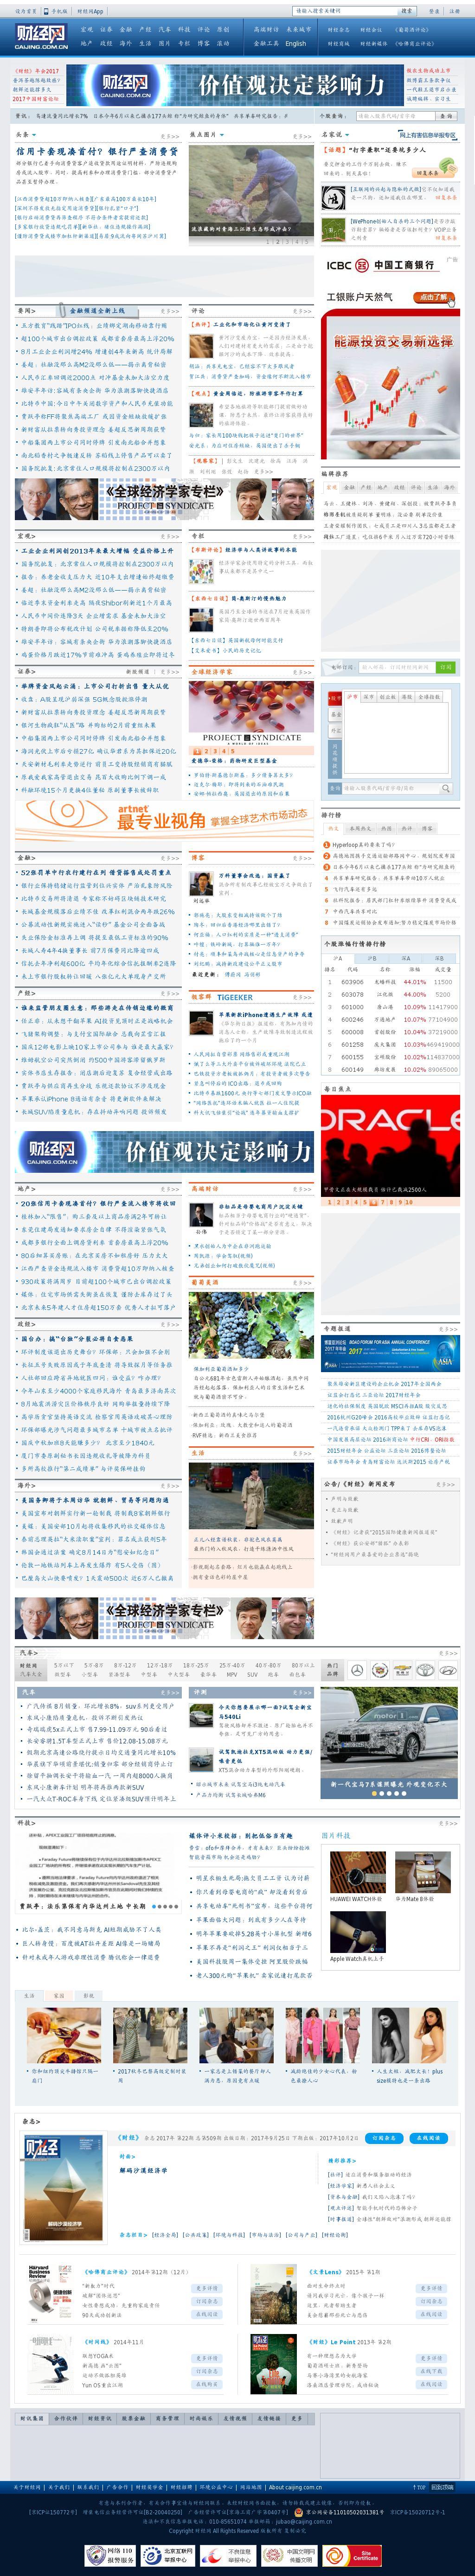 Caijing at Wednesday Sept. 27, 2017, 1:03 p.m. UTC